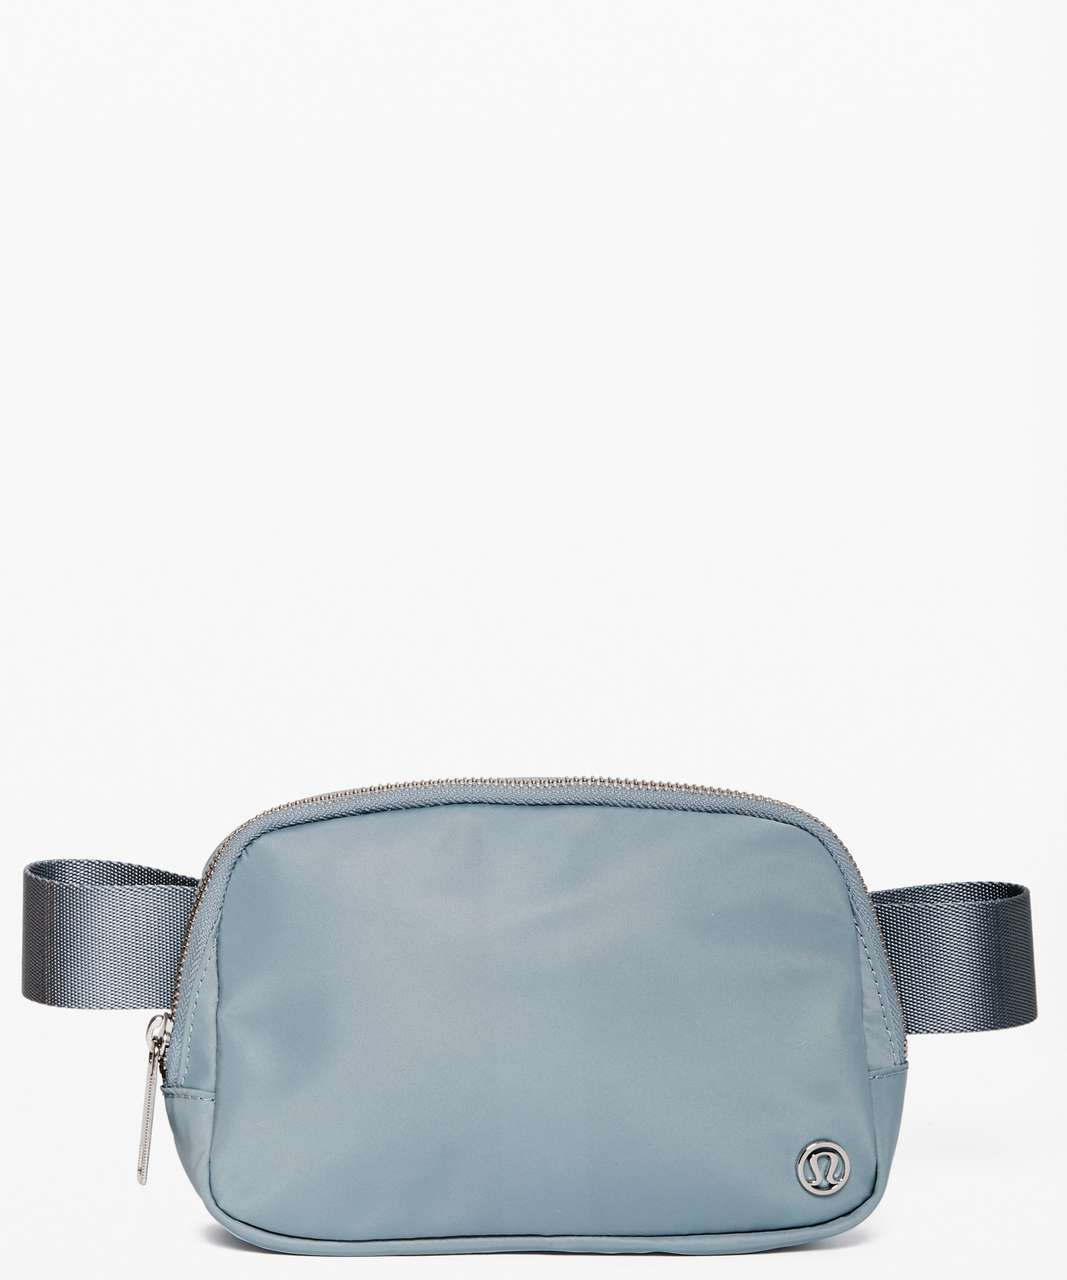 Lululemon Everywhere Belt Bag *1L - Chambray